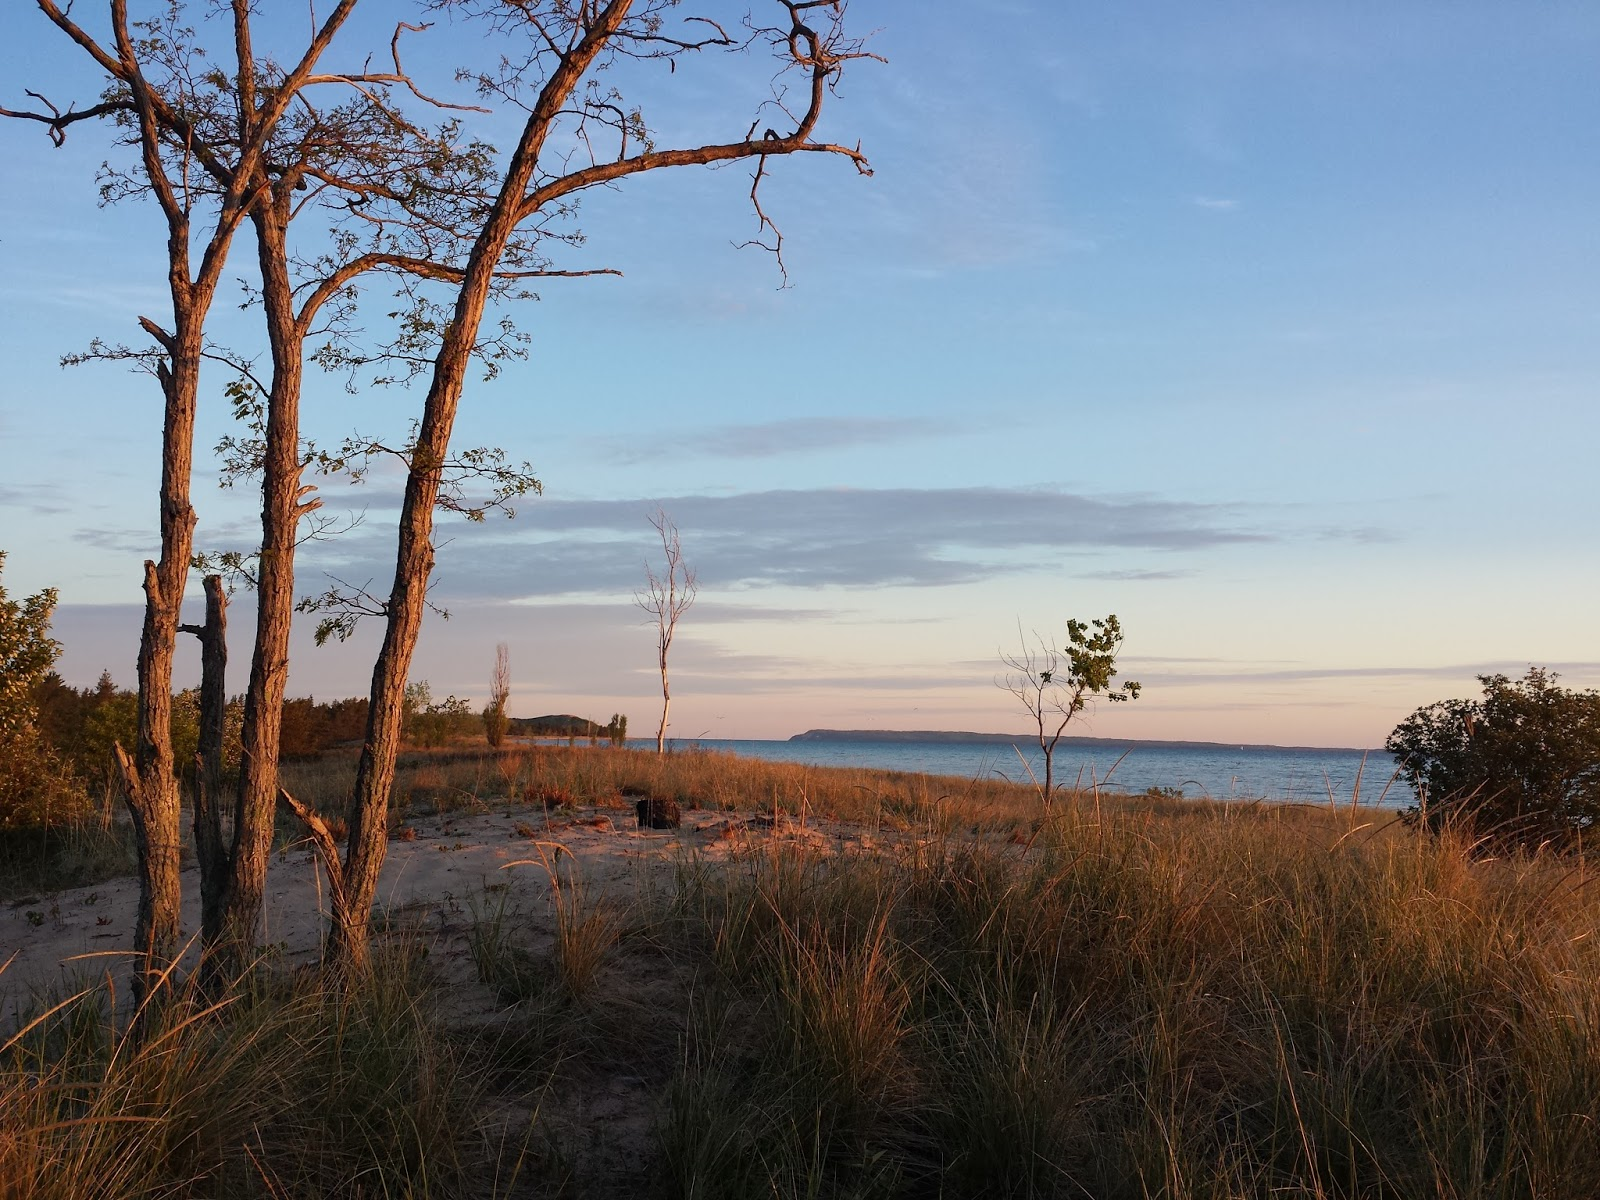 Kelly Time: Sleeping Bear Dunes